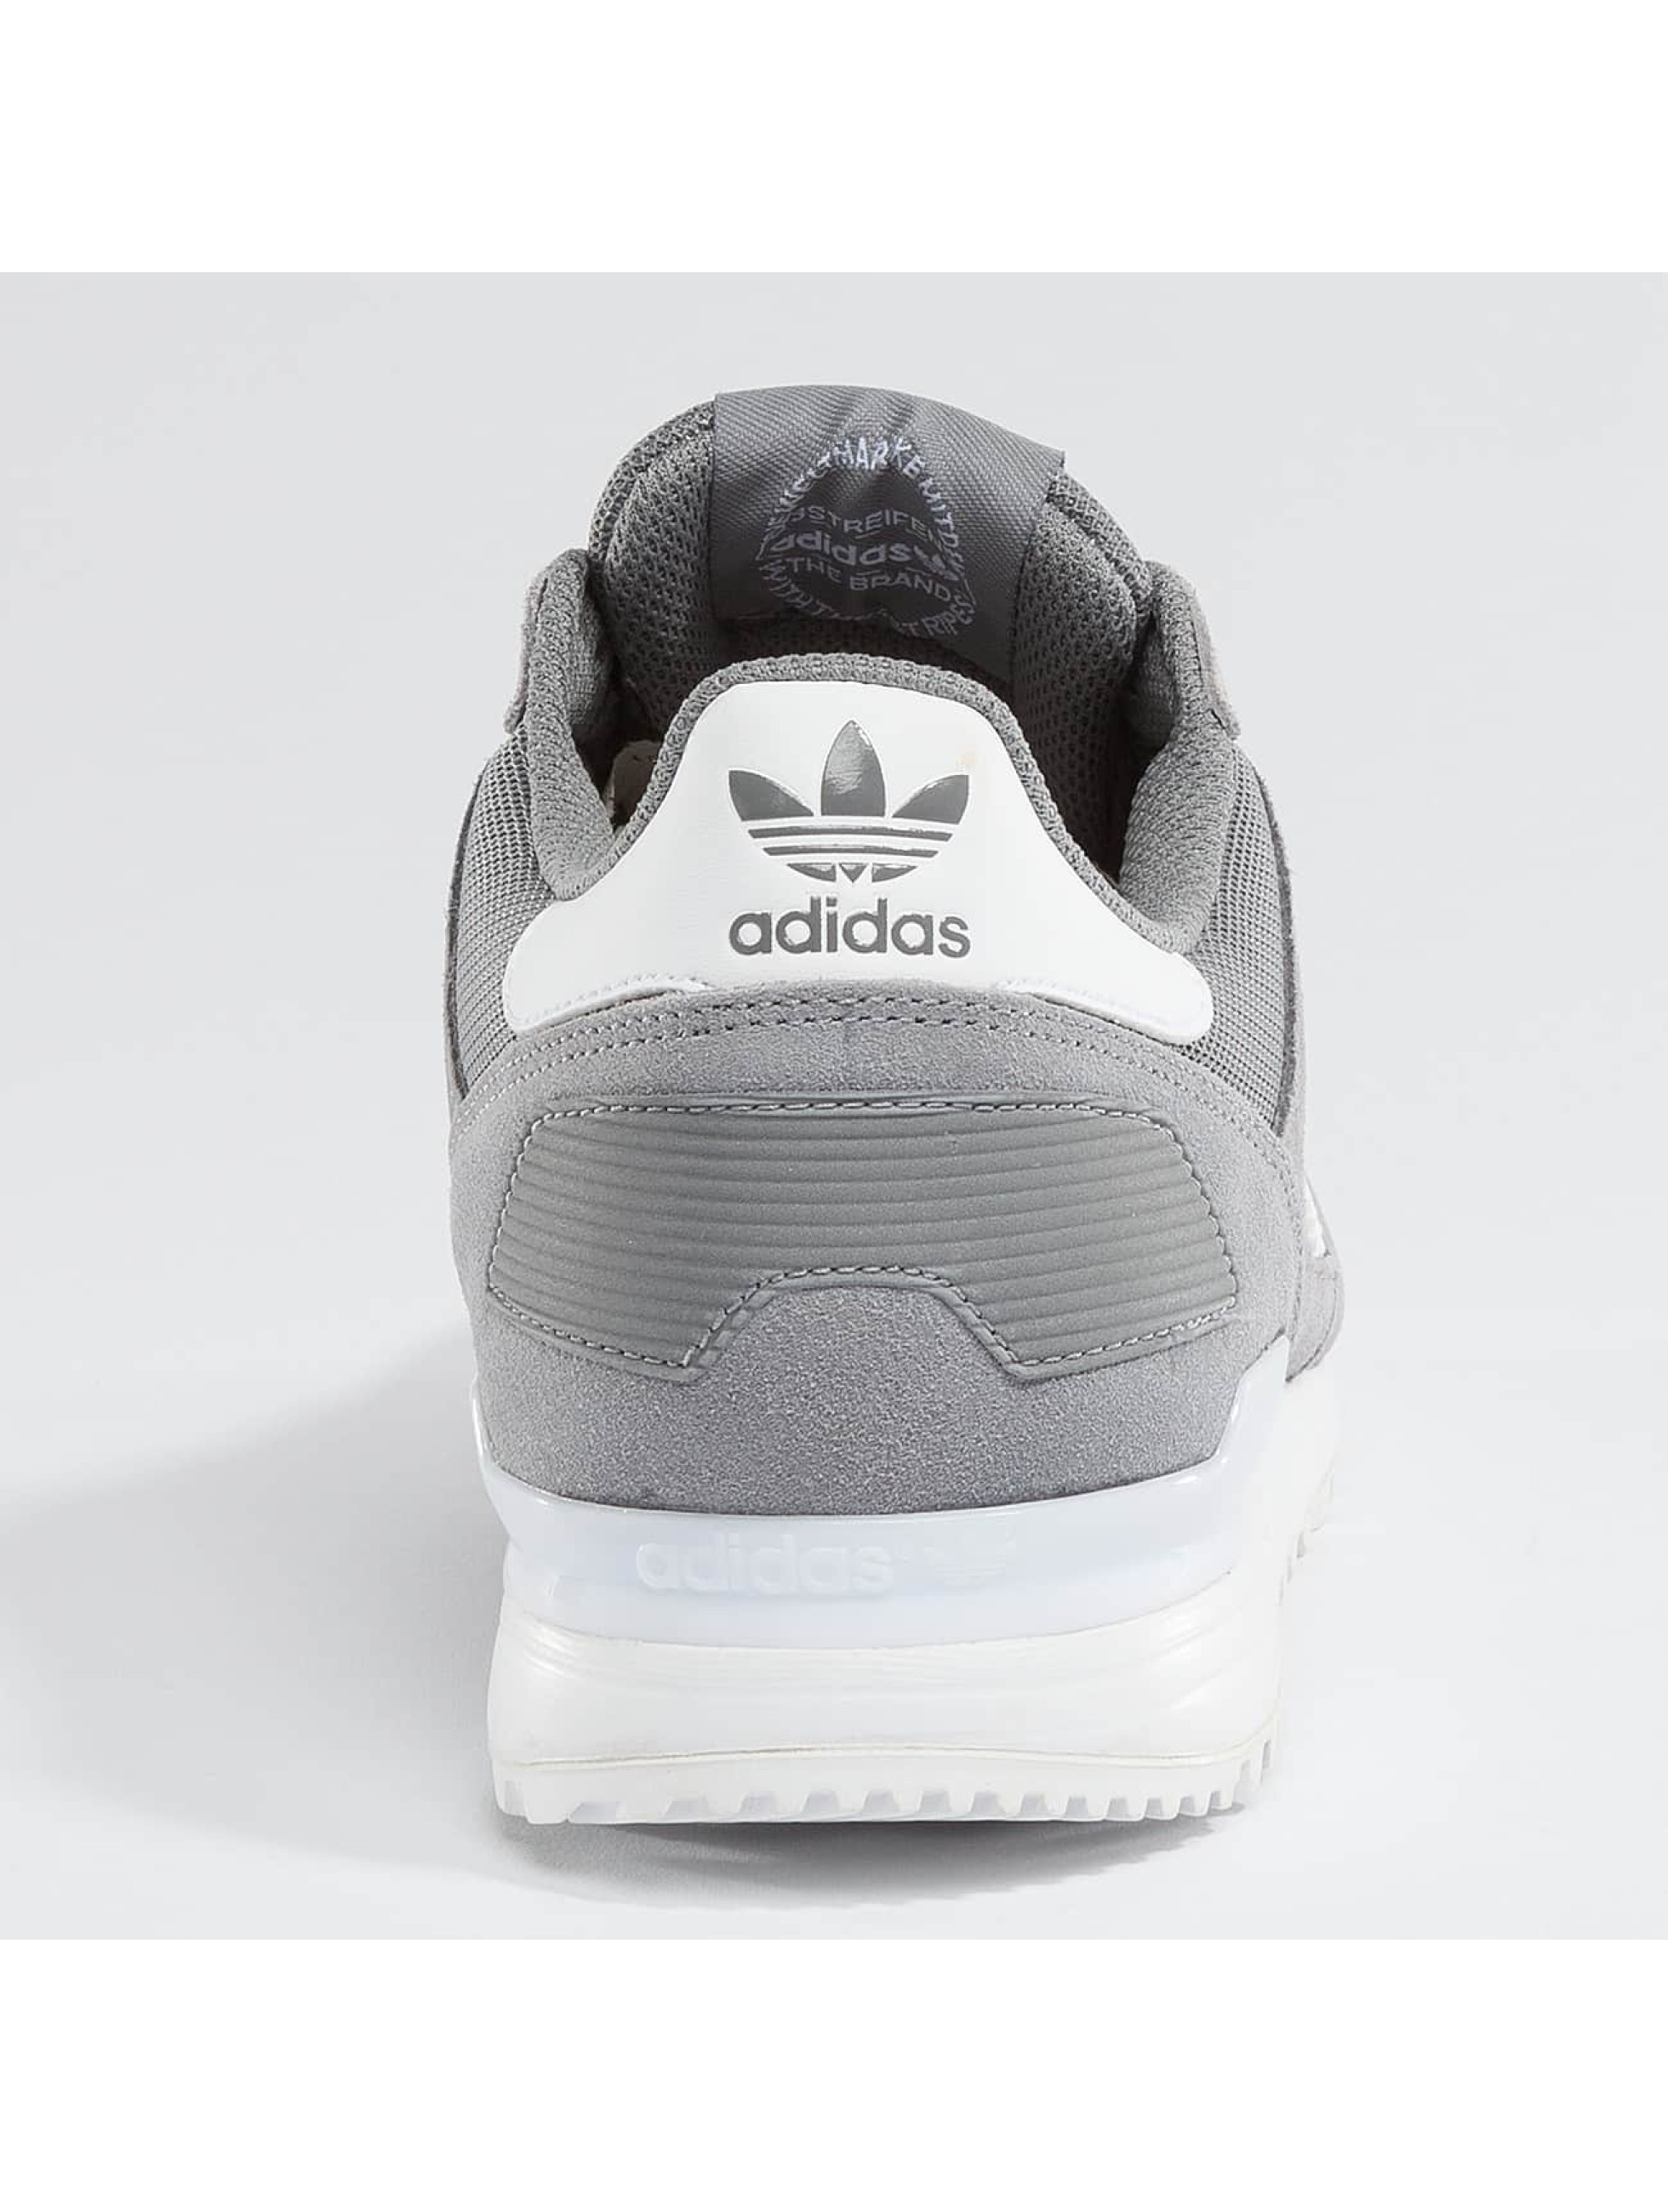 adidas Sneakers ZX 700 grey